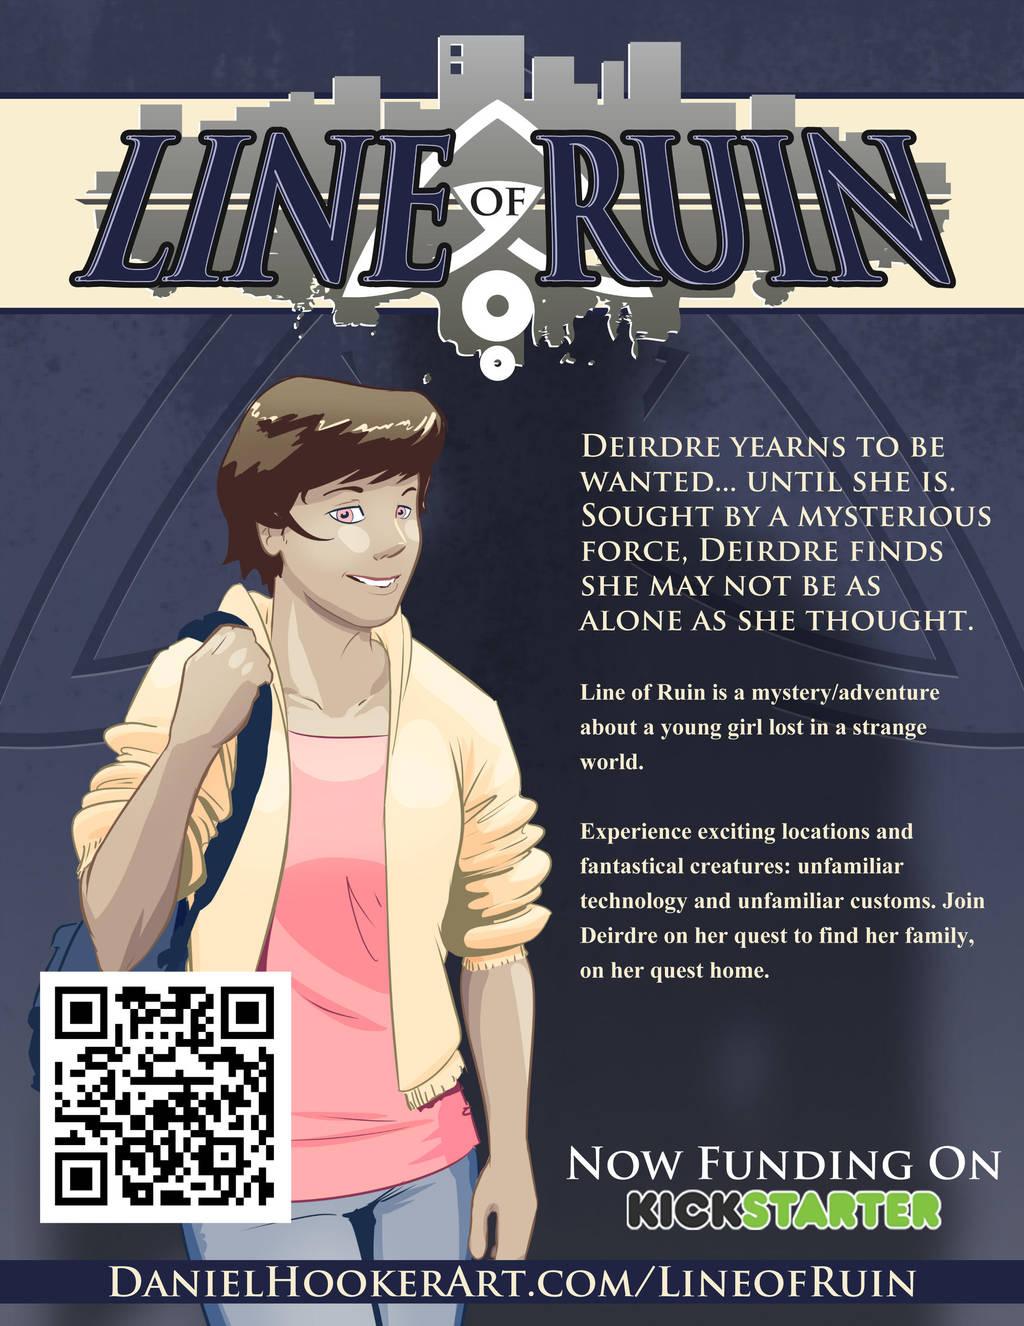 Line of Ruin : Now Funding on Kickstarter by DanielHooker